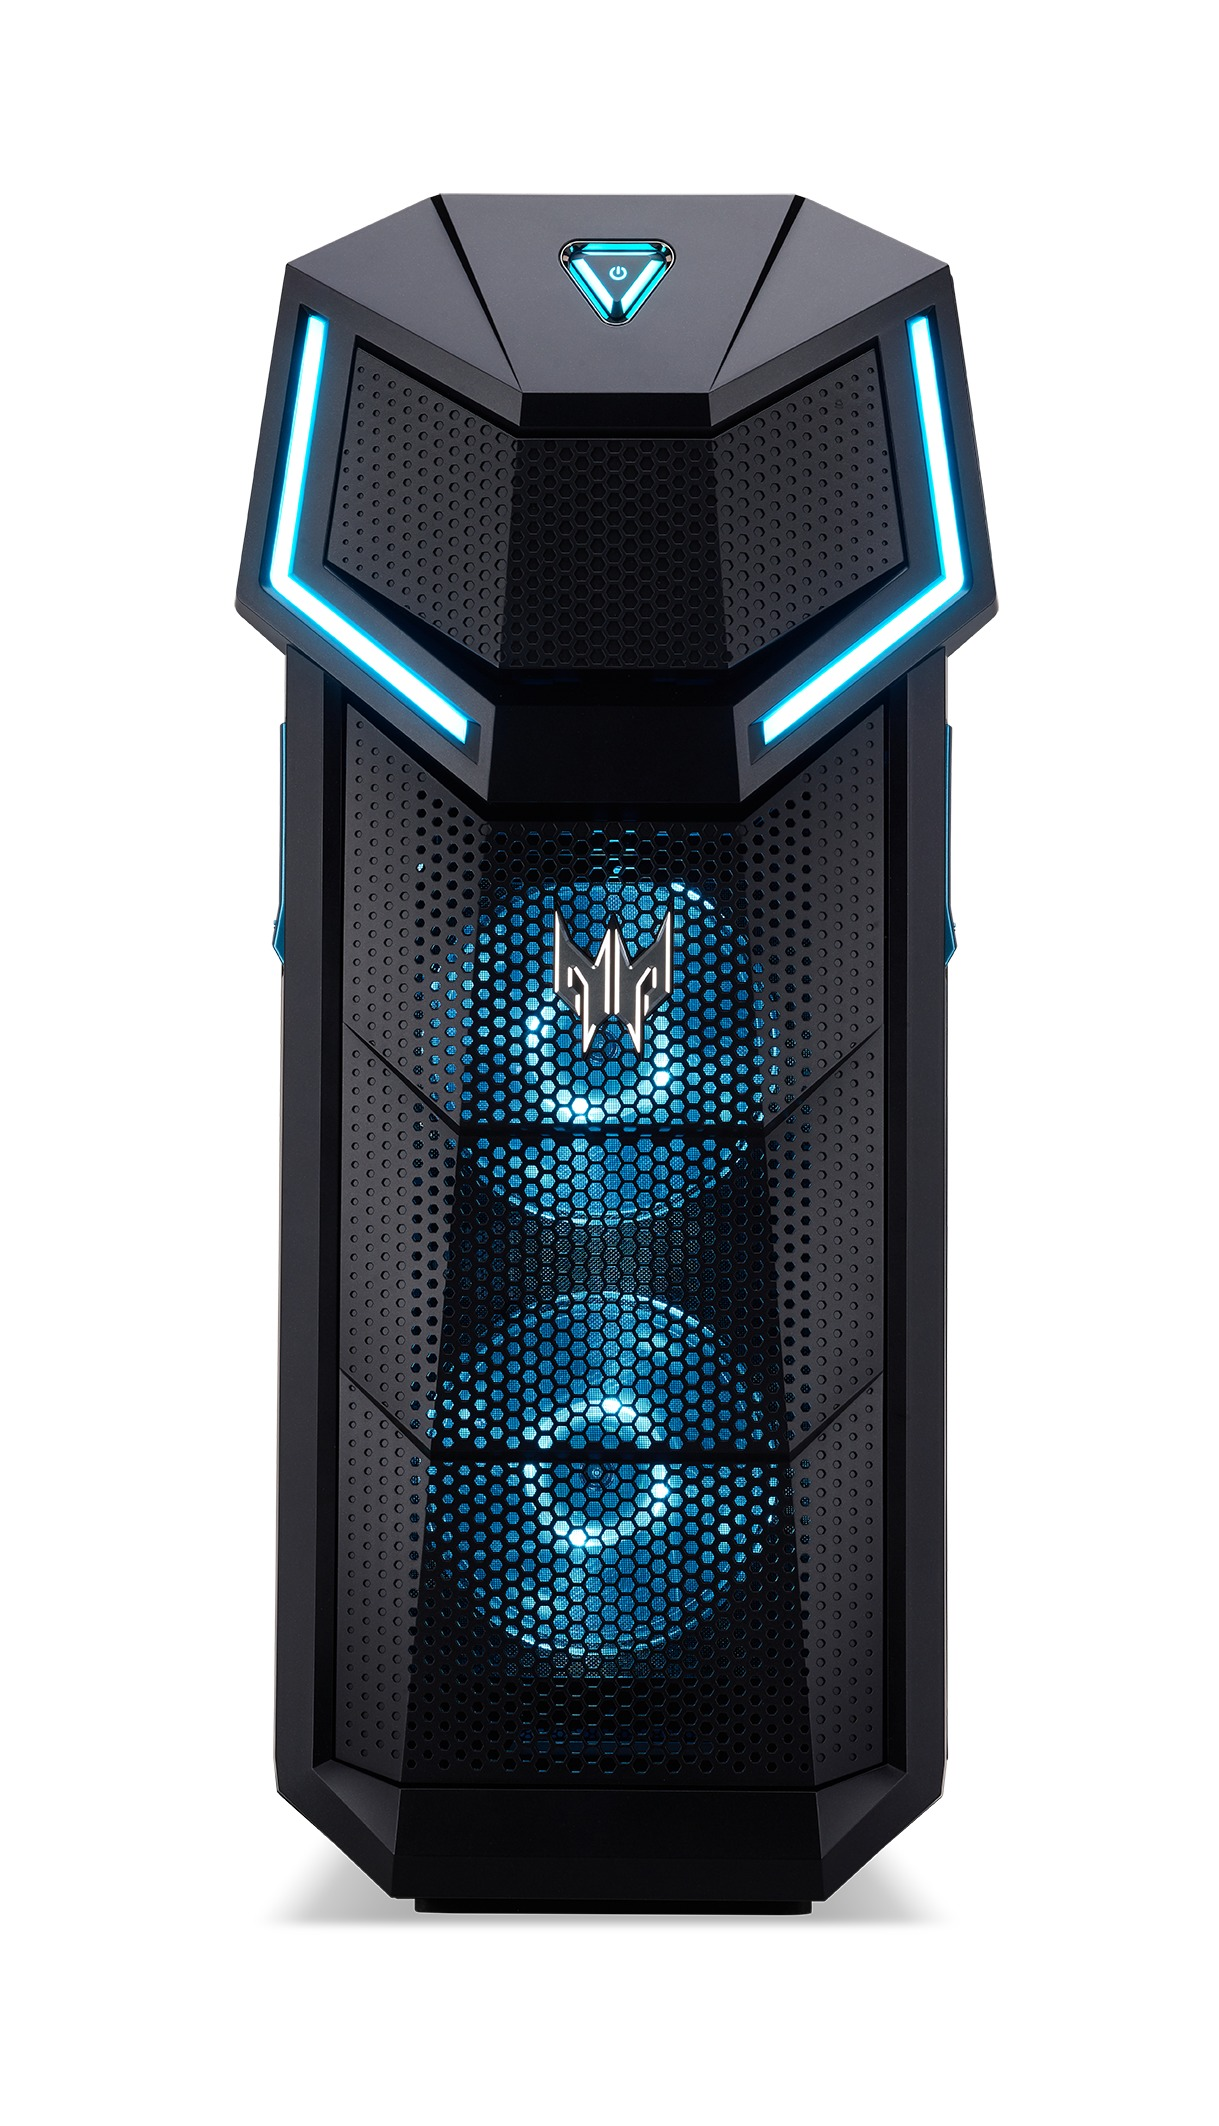 Korting Acer Predator Orion 5000 610 I9207 S desktop